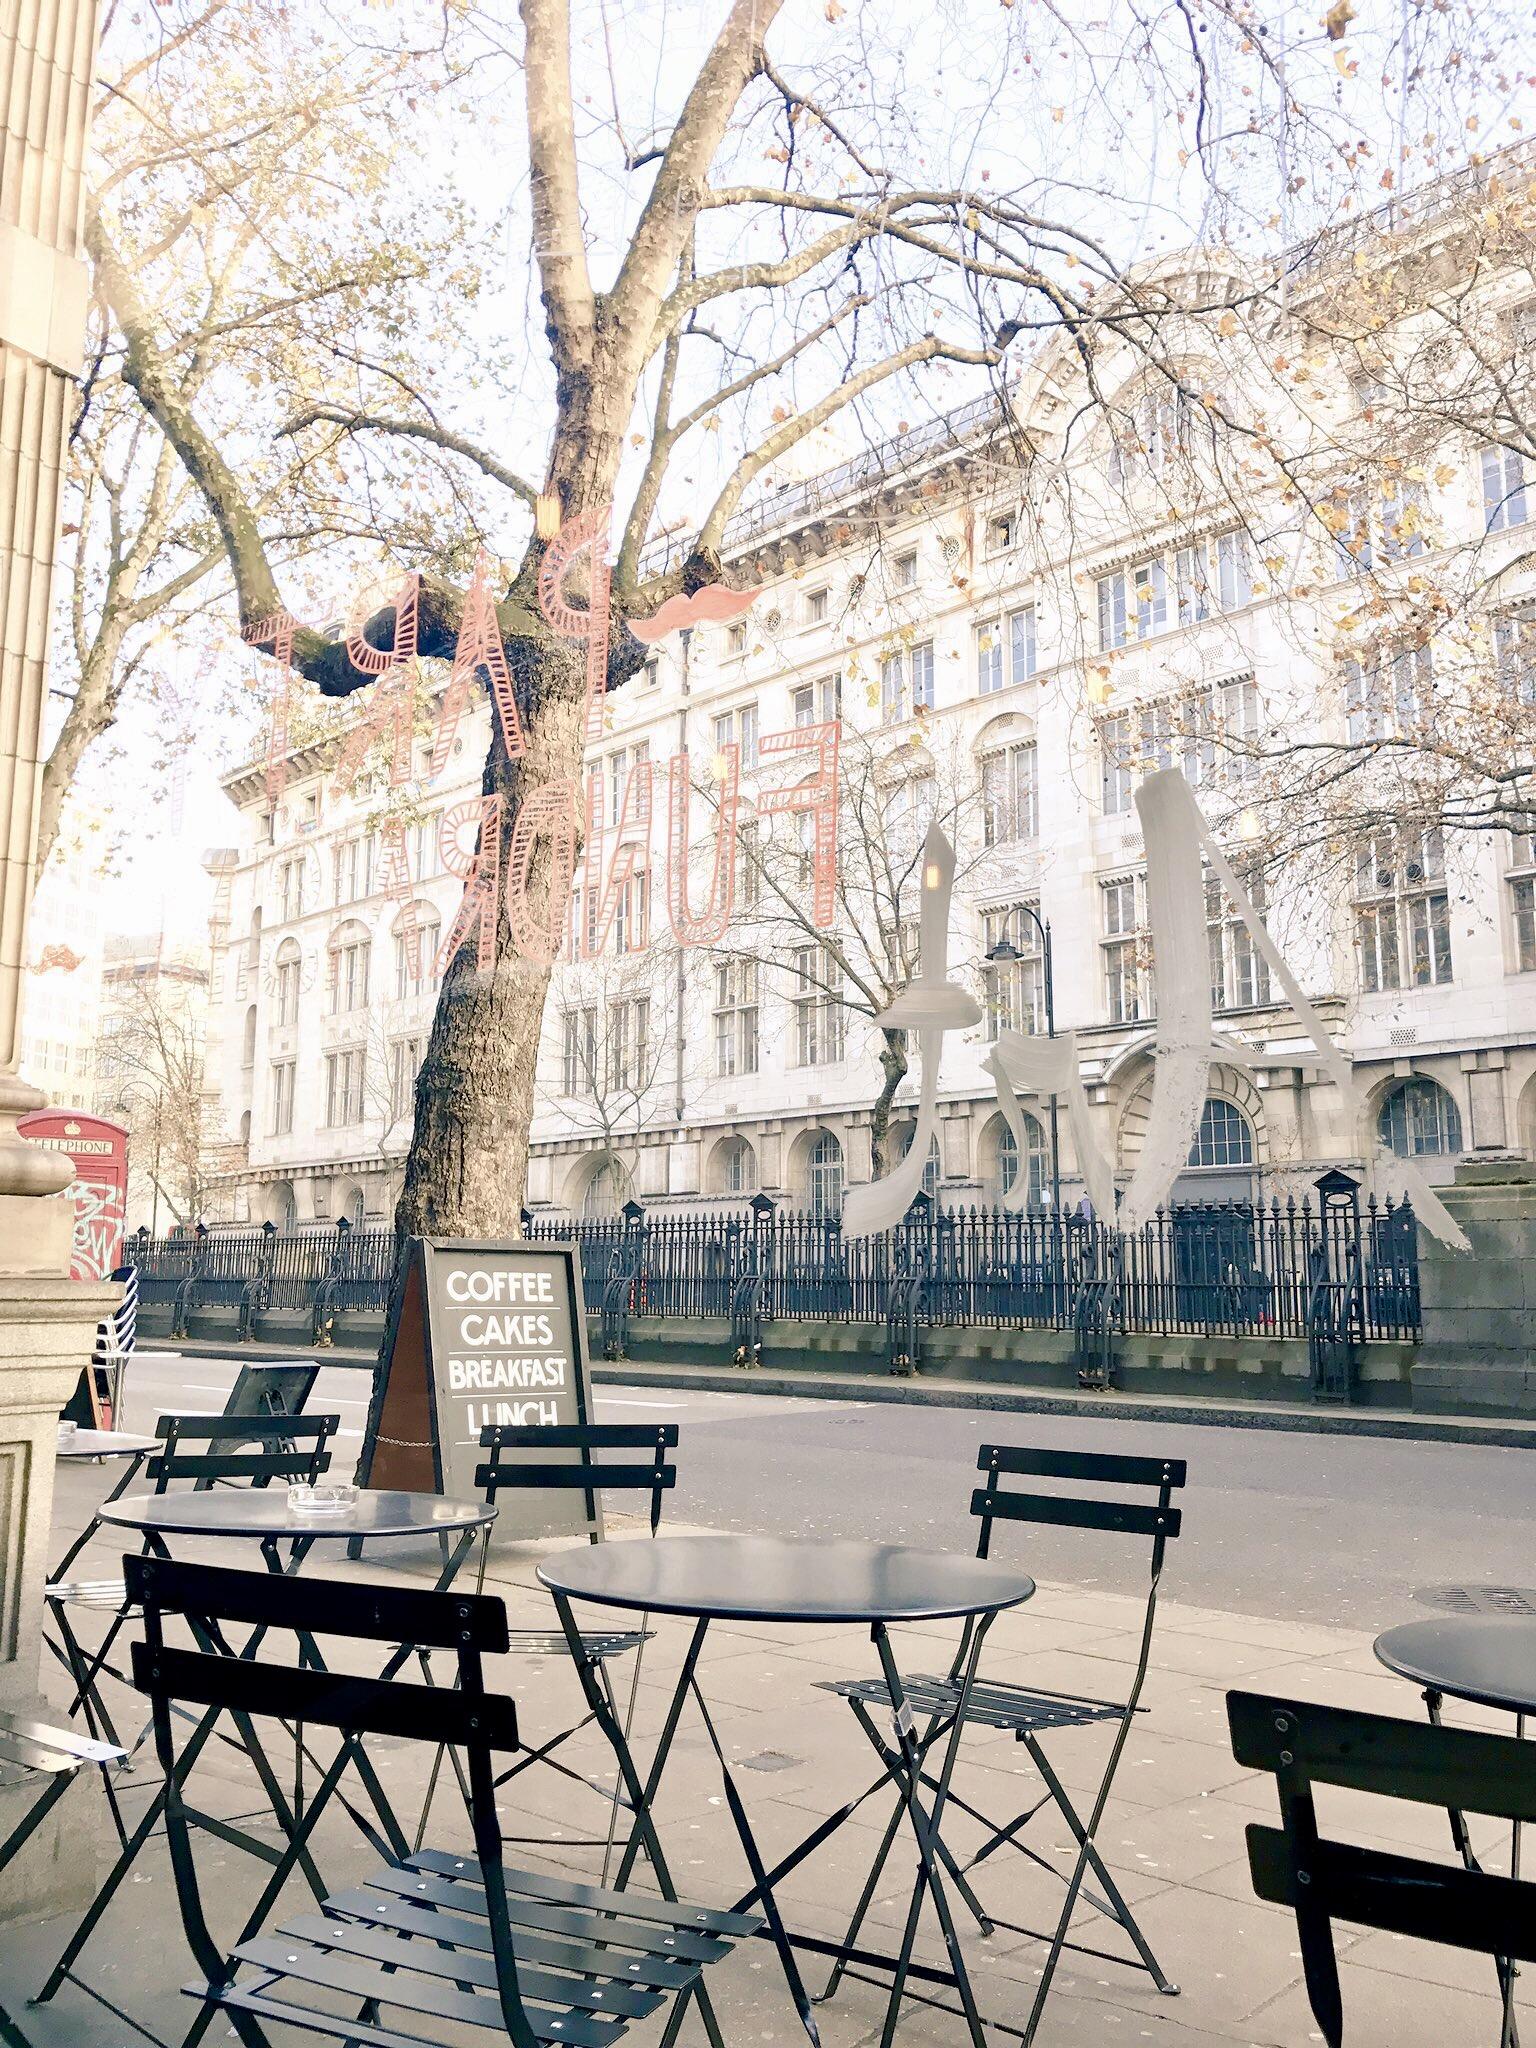 LONDON-CHRISTMAS-MARKET-WINE-FOOD-DISH-YOU-WERE-HERE-LUXURY-FOOD-TRAVEL3.jpg